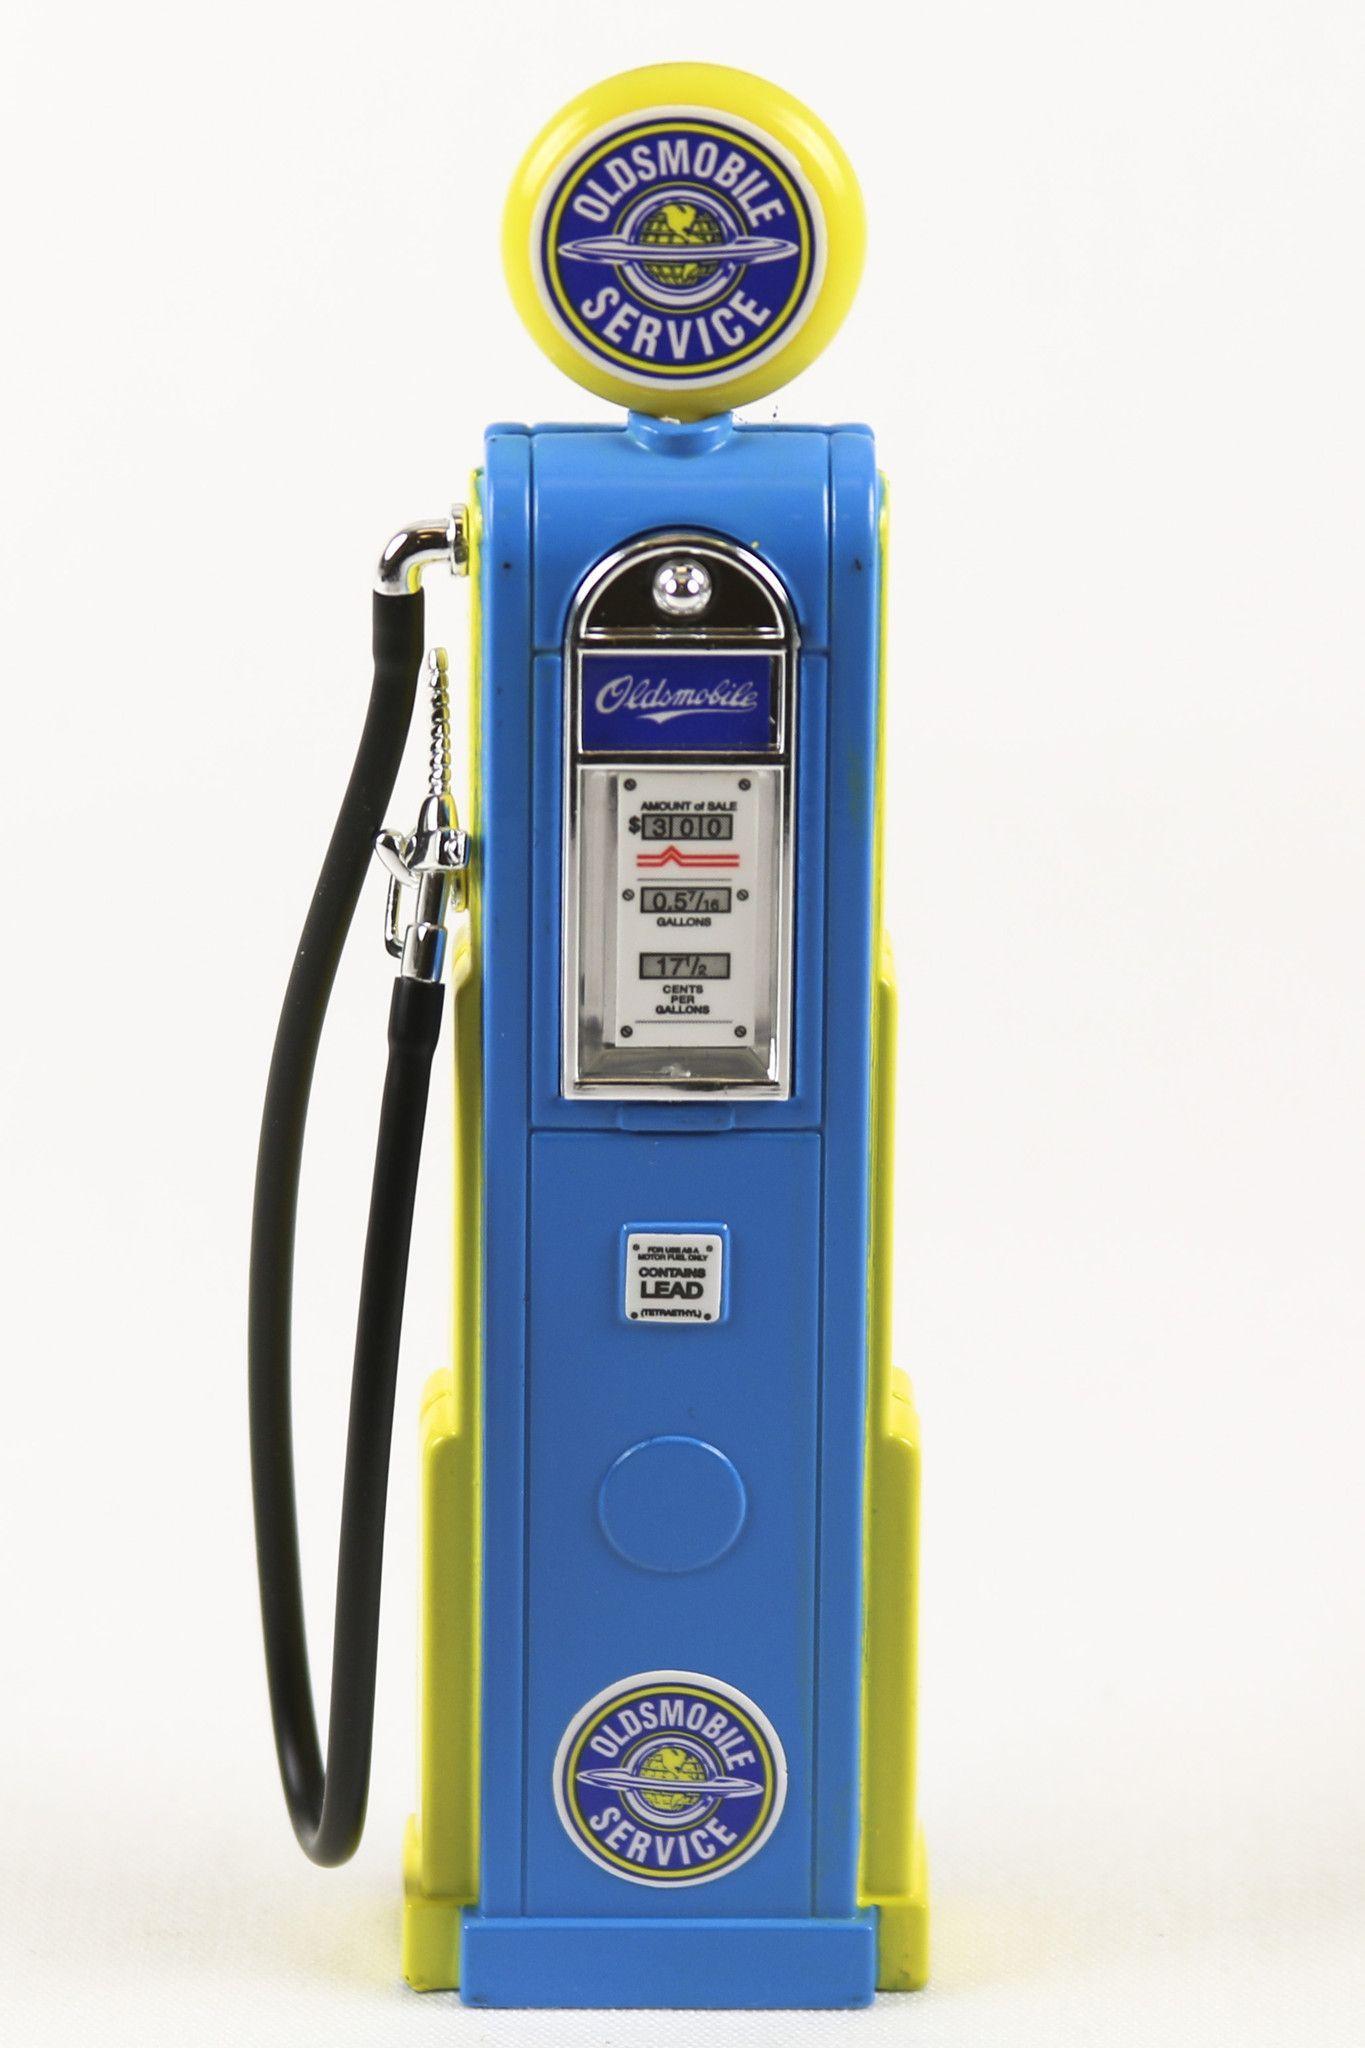 Replica Vintage Digital Gas Pump Oldsmobile Brand 1//18